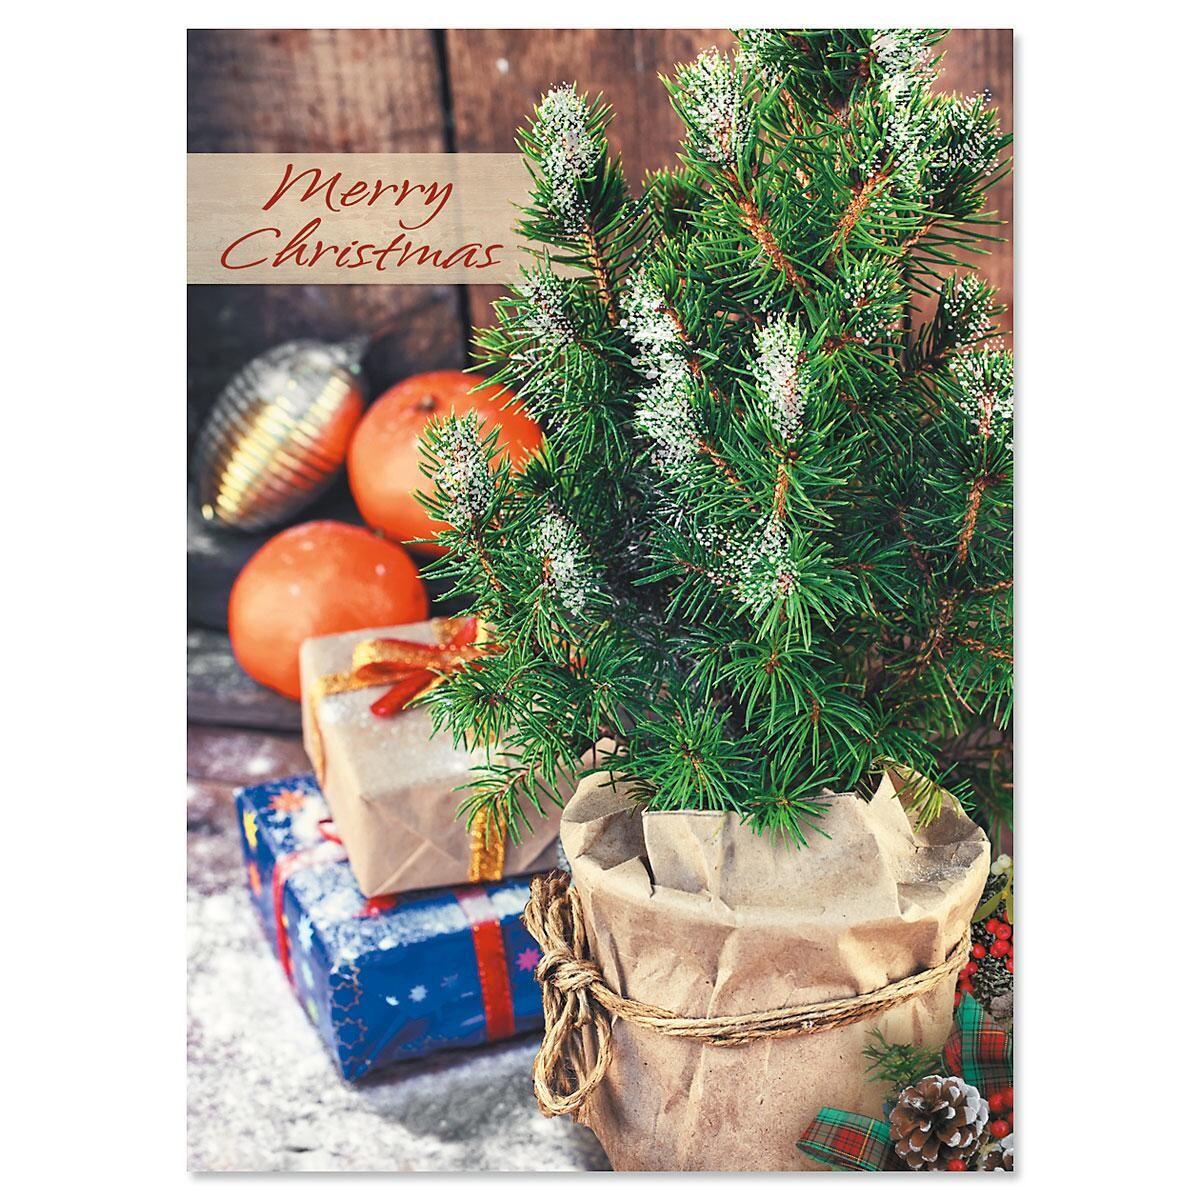 Winter Celebration Nonpersonalized Christmas Cards - Set of 18